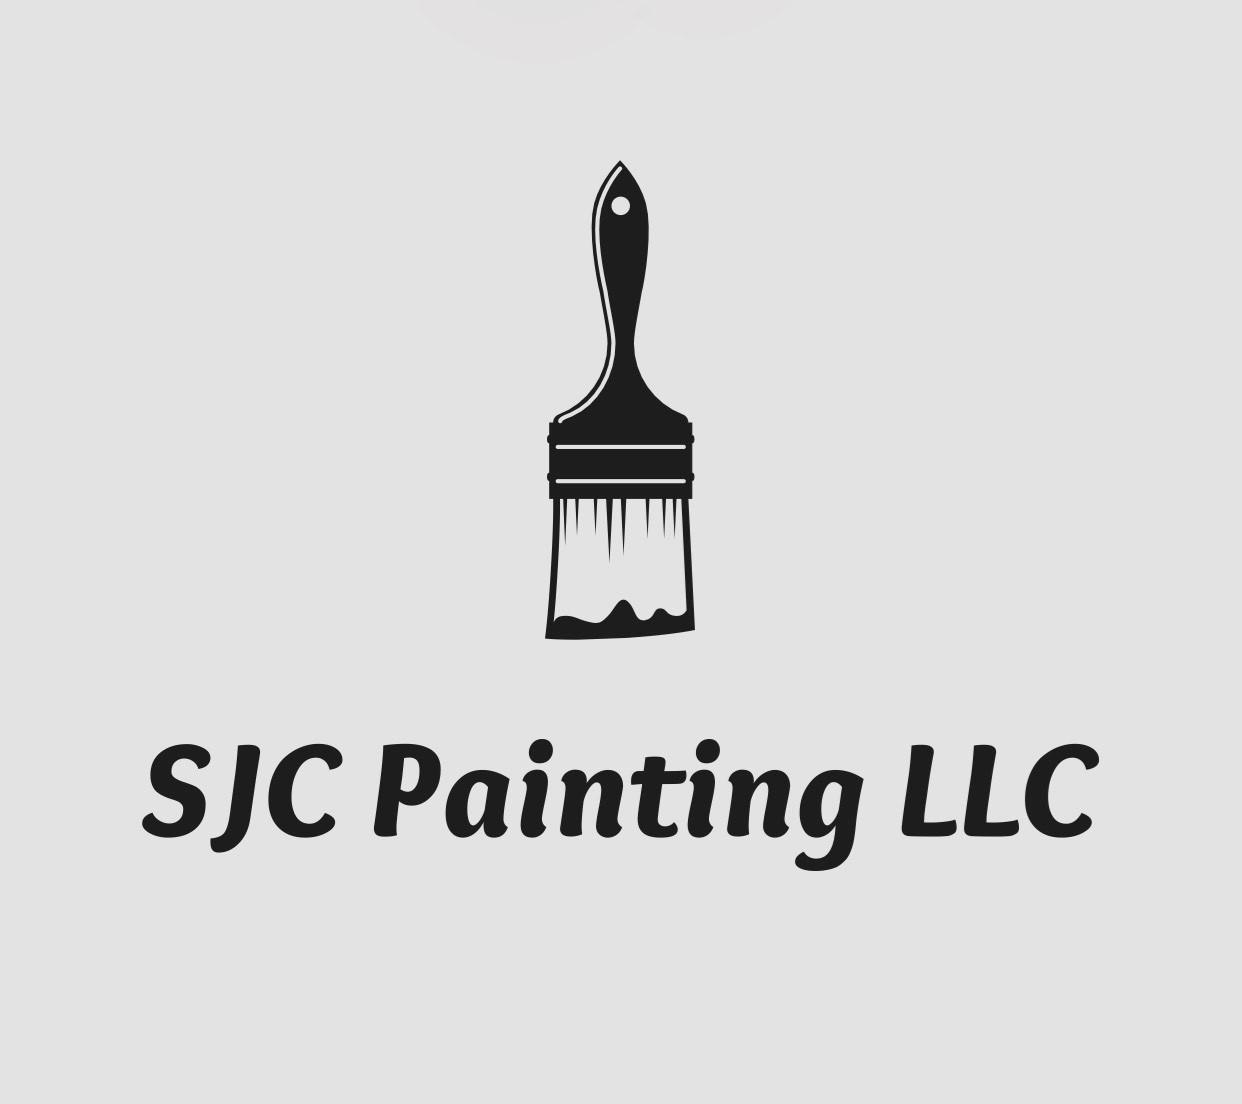 S J C PAINTING LLC logo